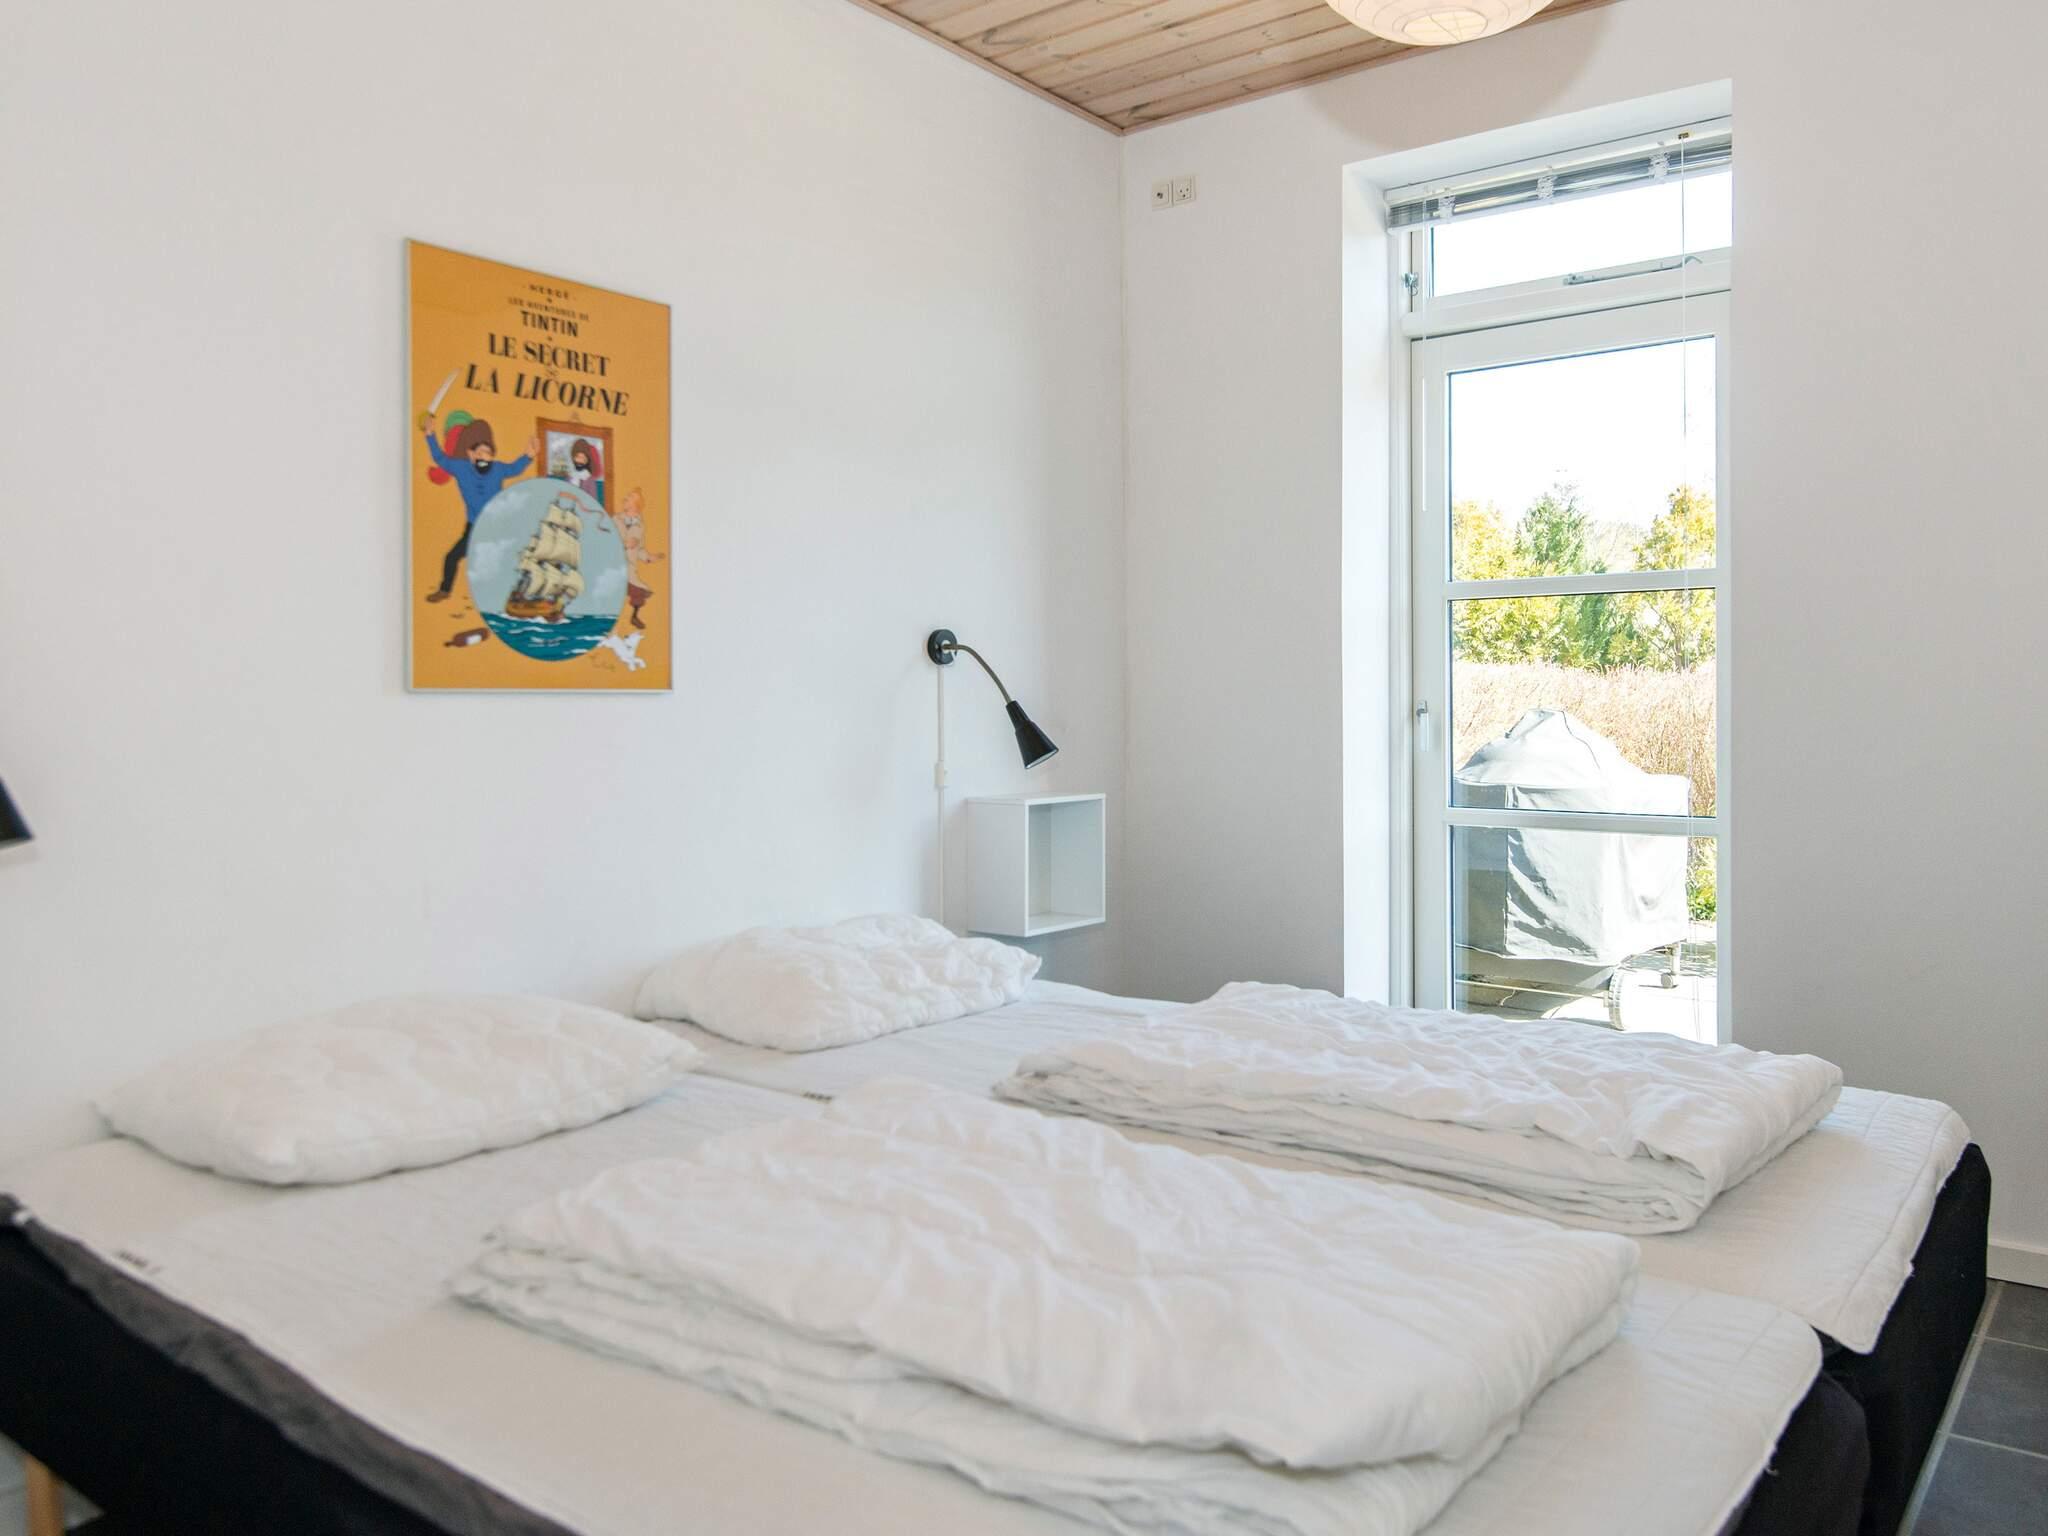 Maison de vacances Helgenæs (590964), Knebel, , Mer Baltique danoise, Danemark, image 13